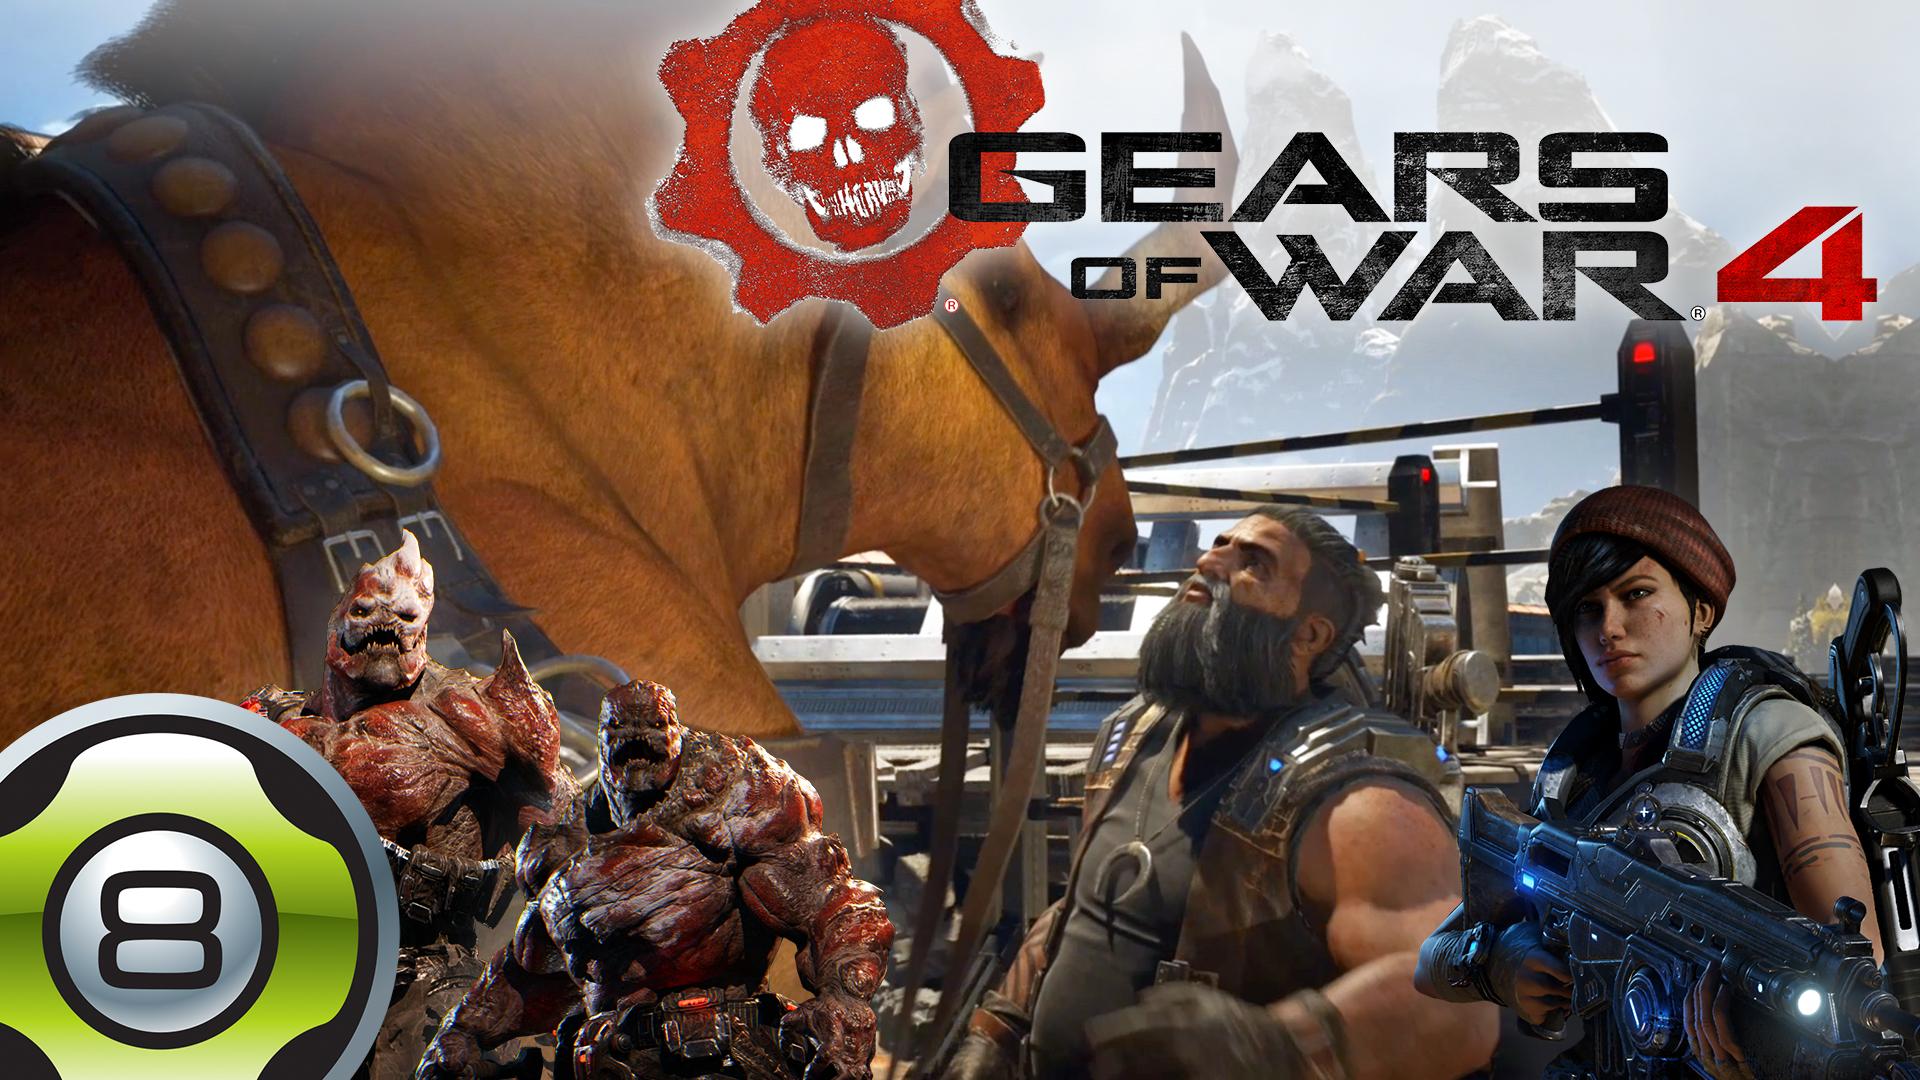 Let's Play sur Gears of War 4